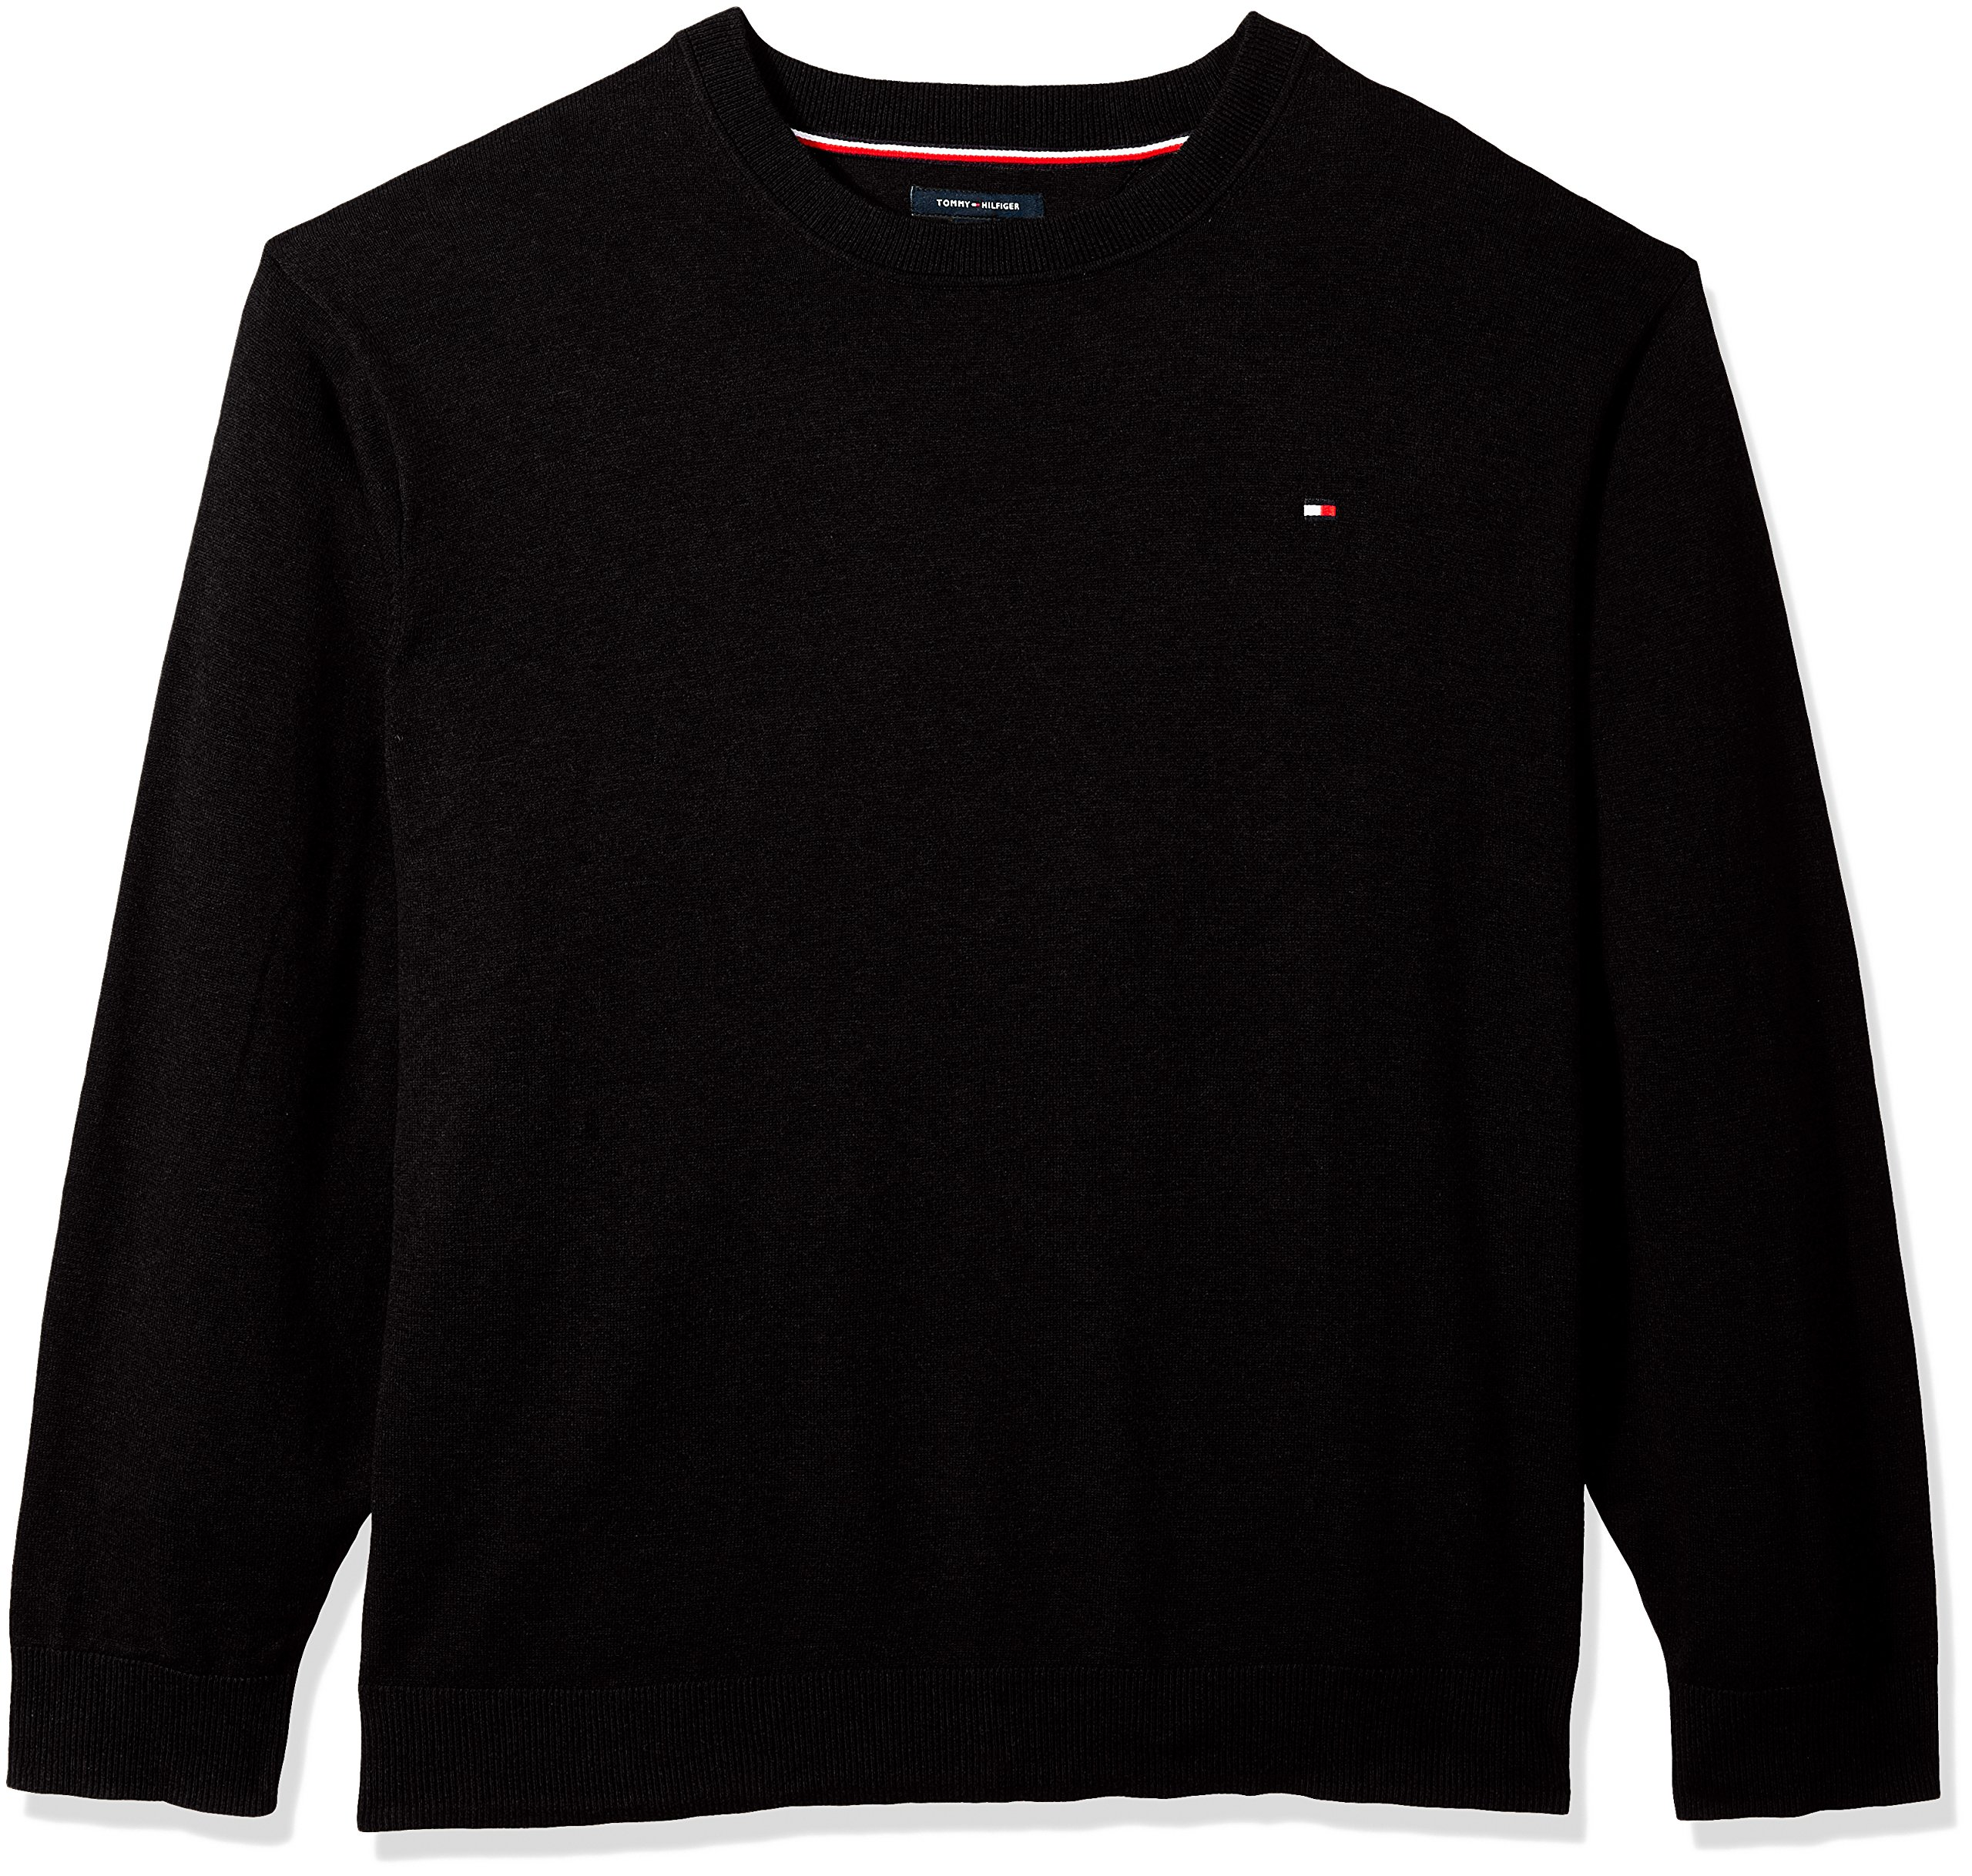 Tommy Hilfiger Men's Big and Tall Sweater Signature Solid Crewneck, Deep Knit Black, TL-L